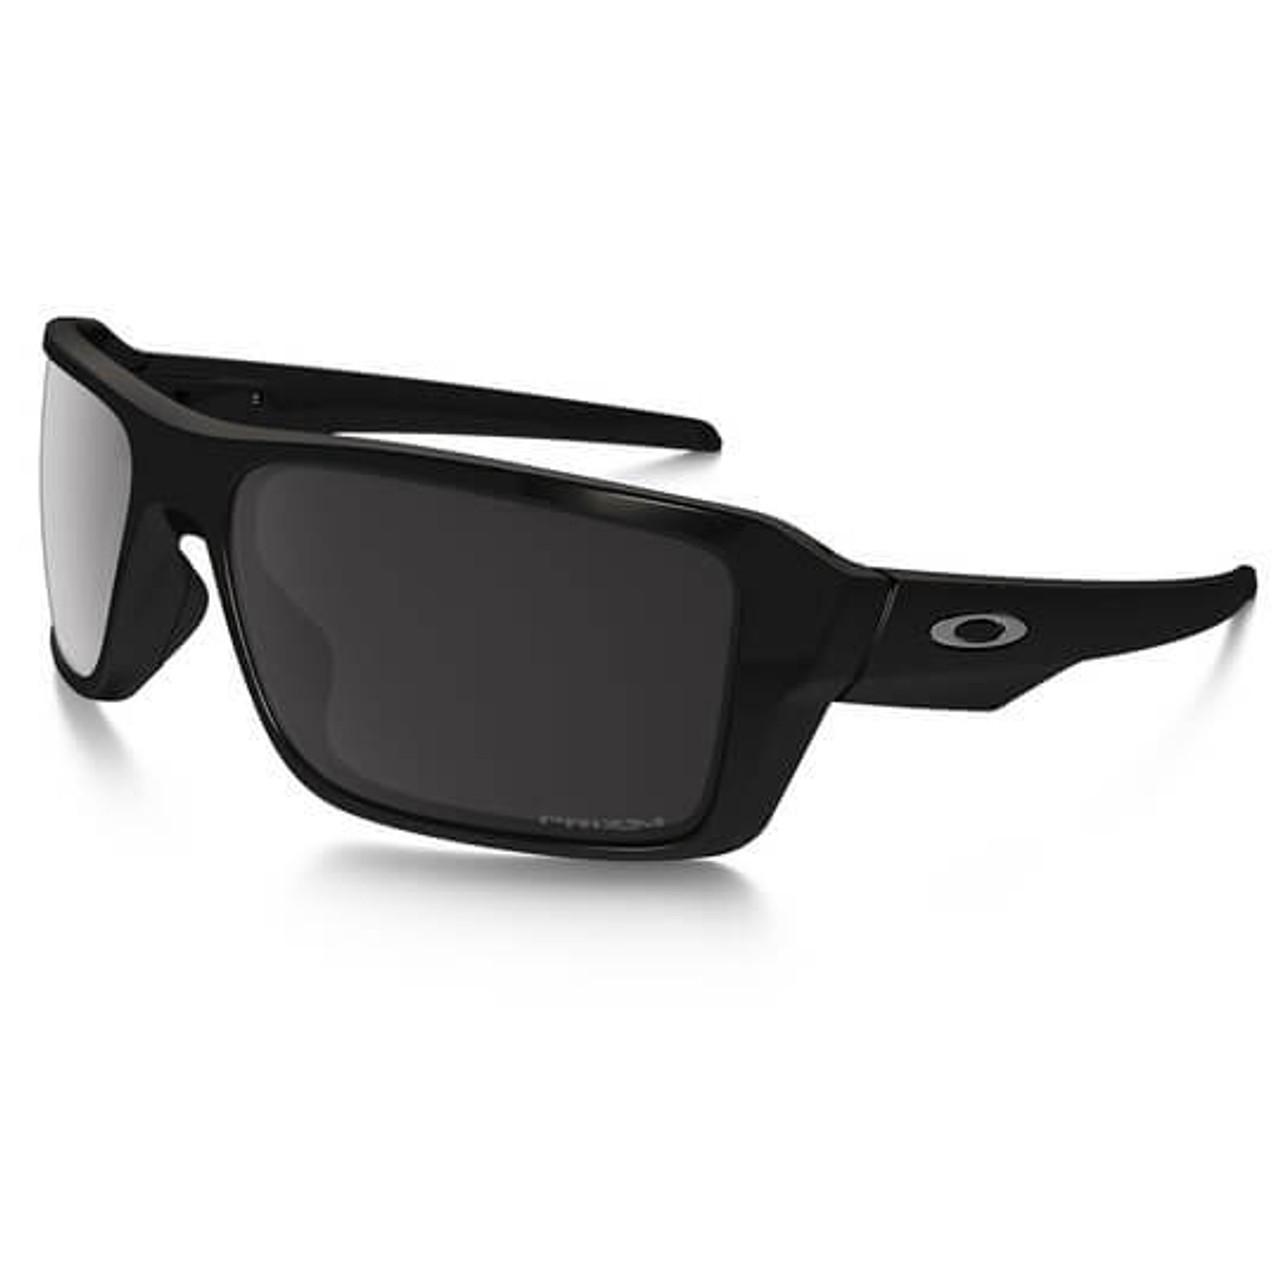 c149553fed19c Oakley - Double Edge (Polished Black Frame w  Prizm Black Polarized Lens) -  Amped Airsoft